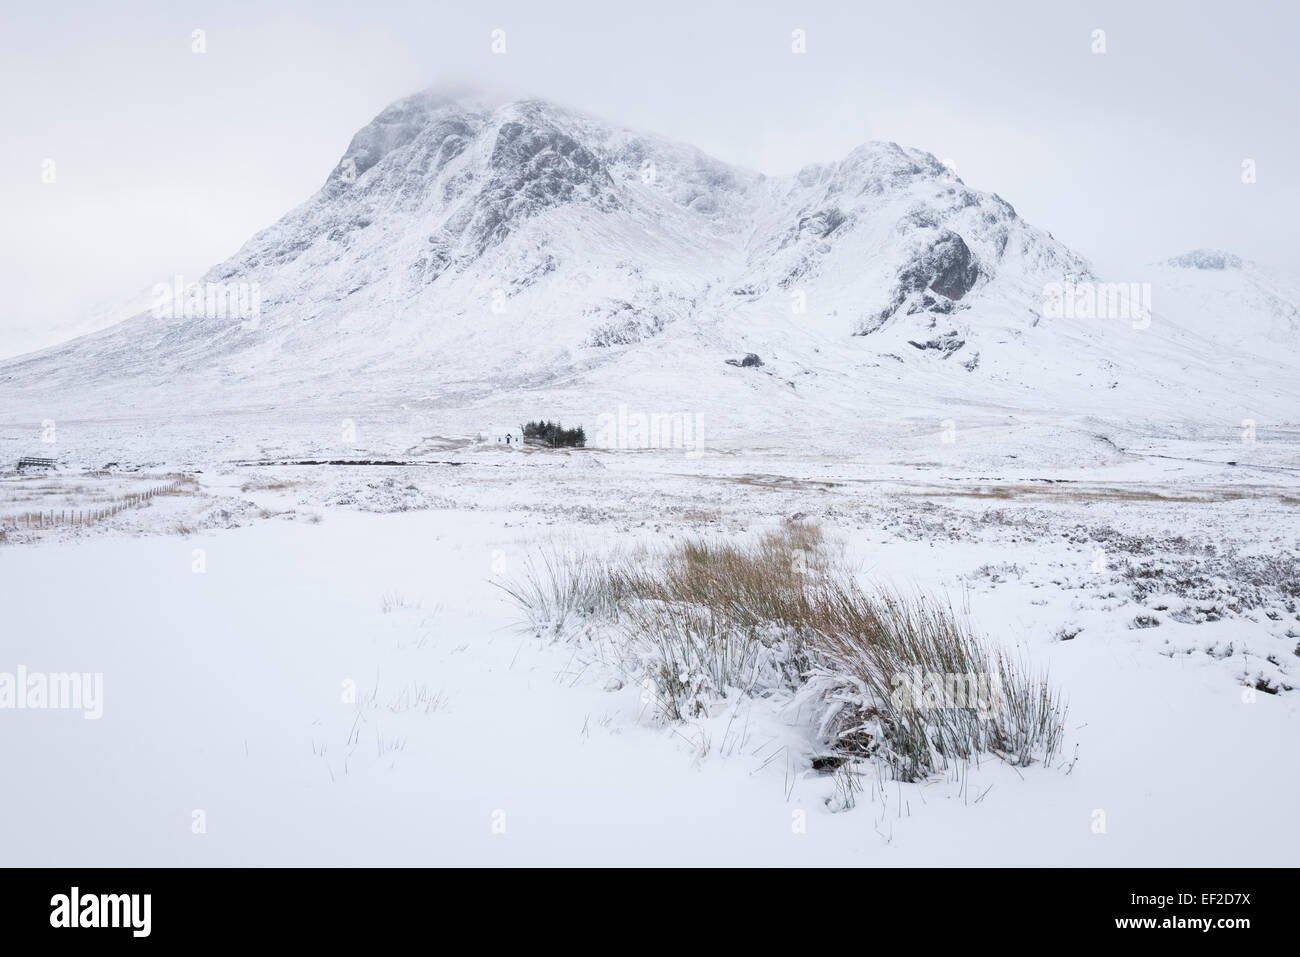 Buachaille Etive Mor from Altnafeadh, Glencoe, Scottish Highlands, Scotland - Stock Image